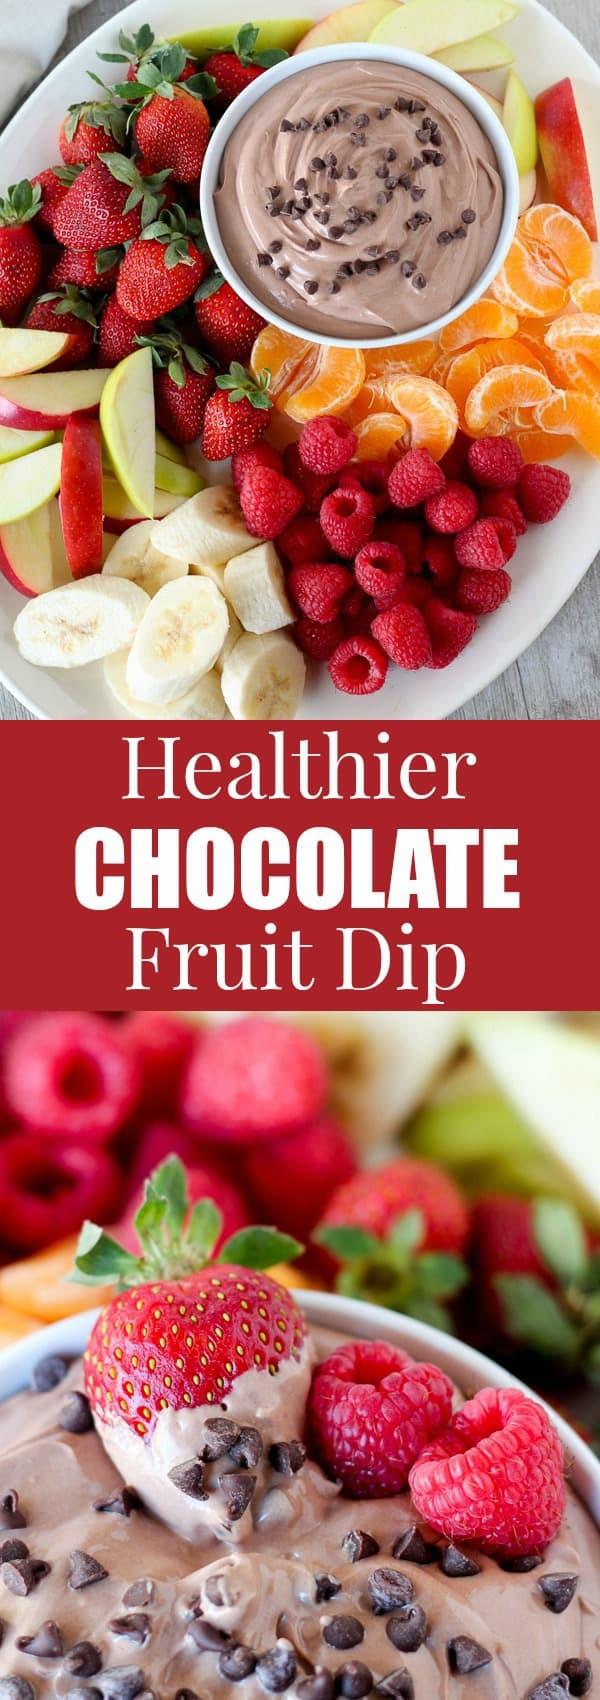 Healthier Chocolate Fruit Dip